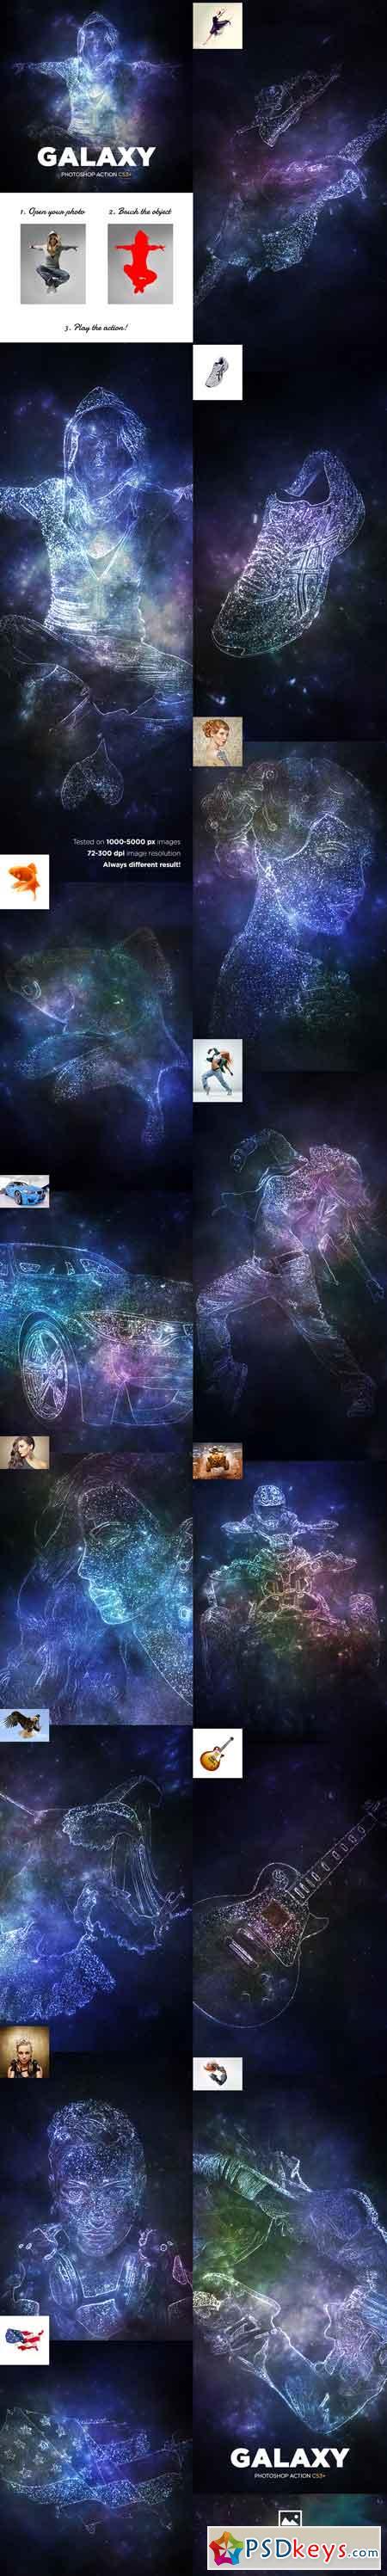 Galaxy Photoshop Action CS3+ 16914670